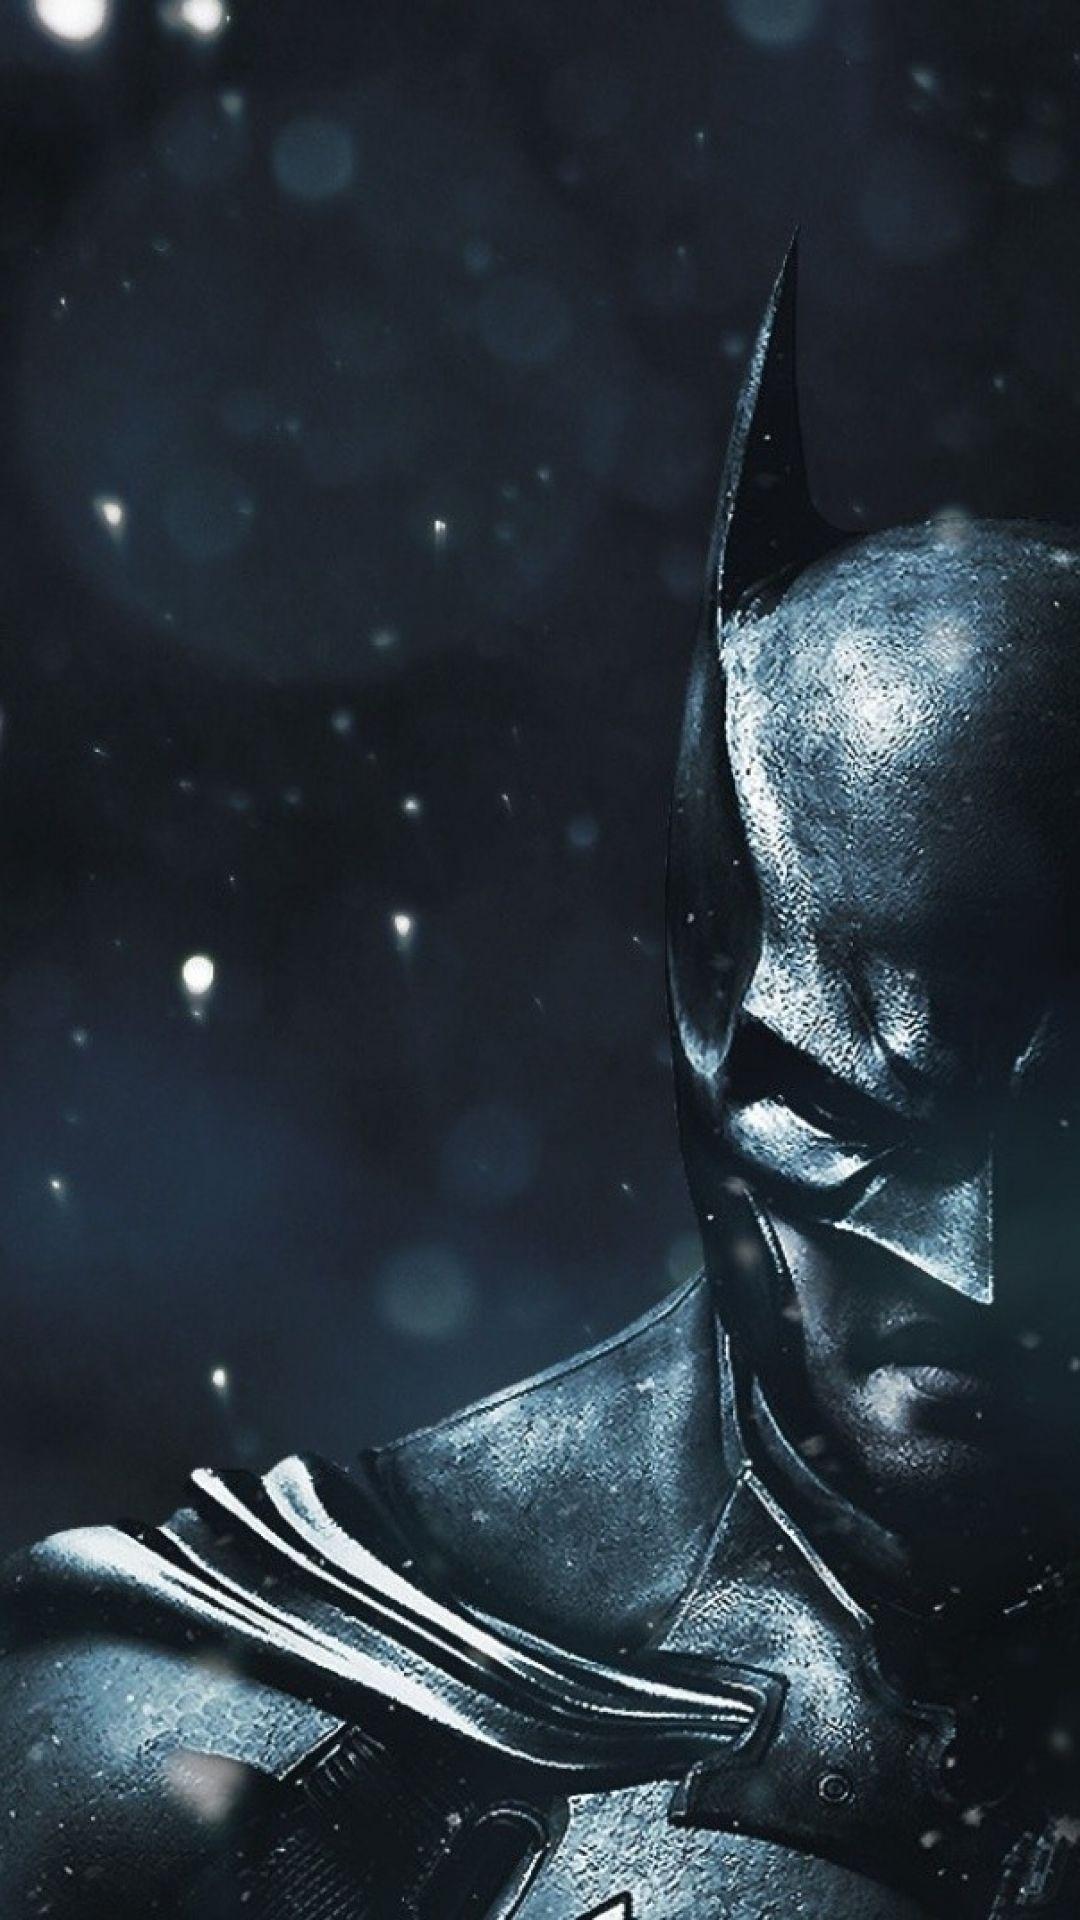 Batman Live Wallpaper : batman, wallpaper, Batman, Wallpapers, Backgrounds, WallpaperAccess